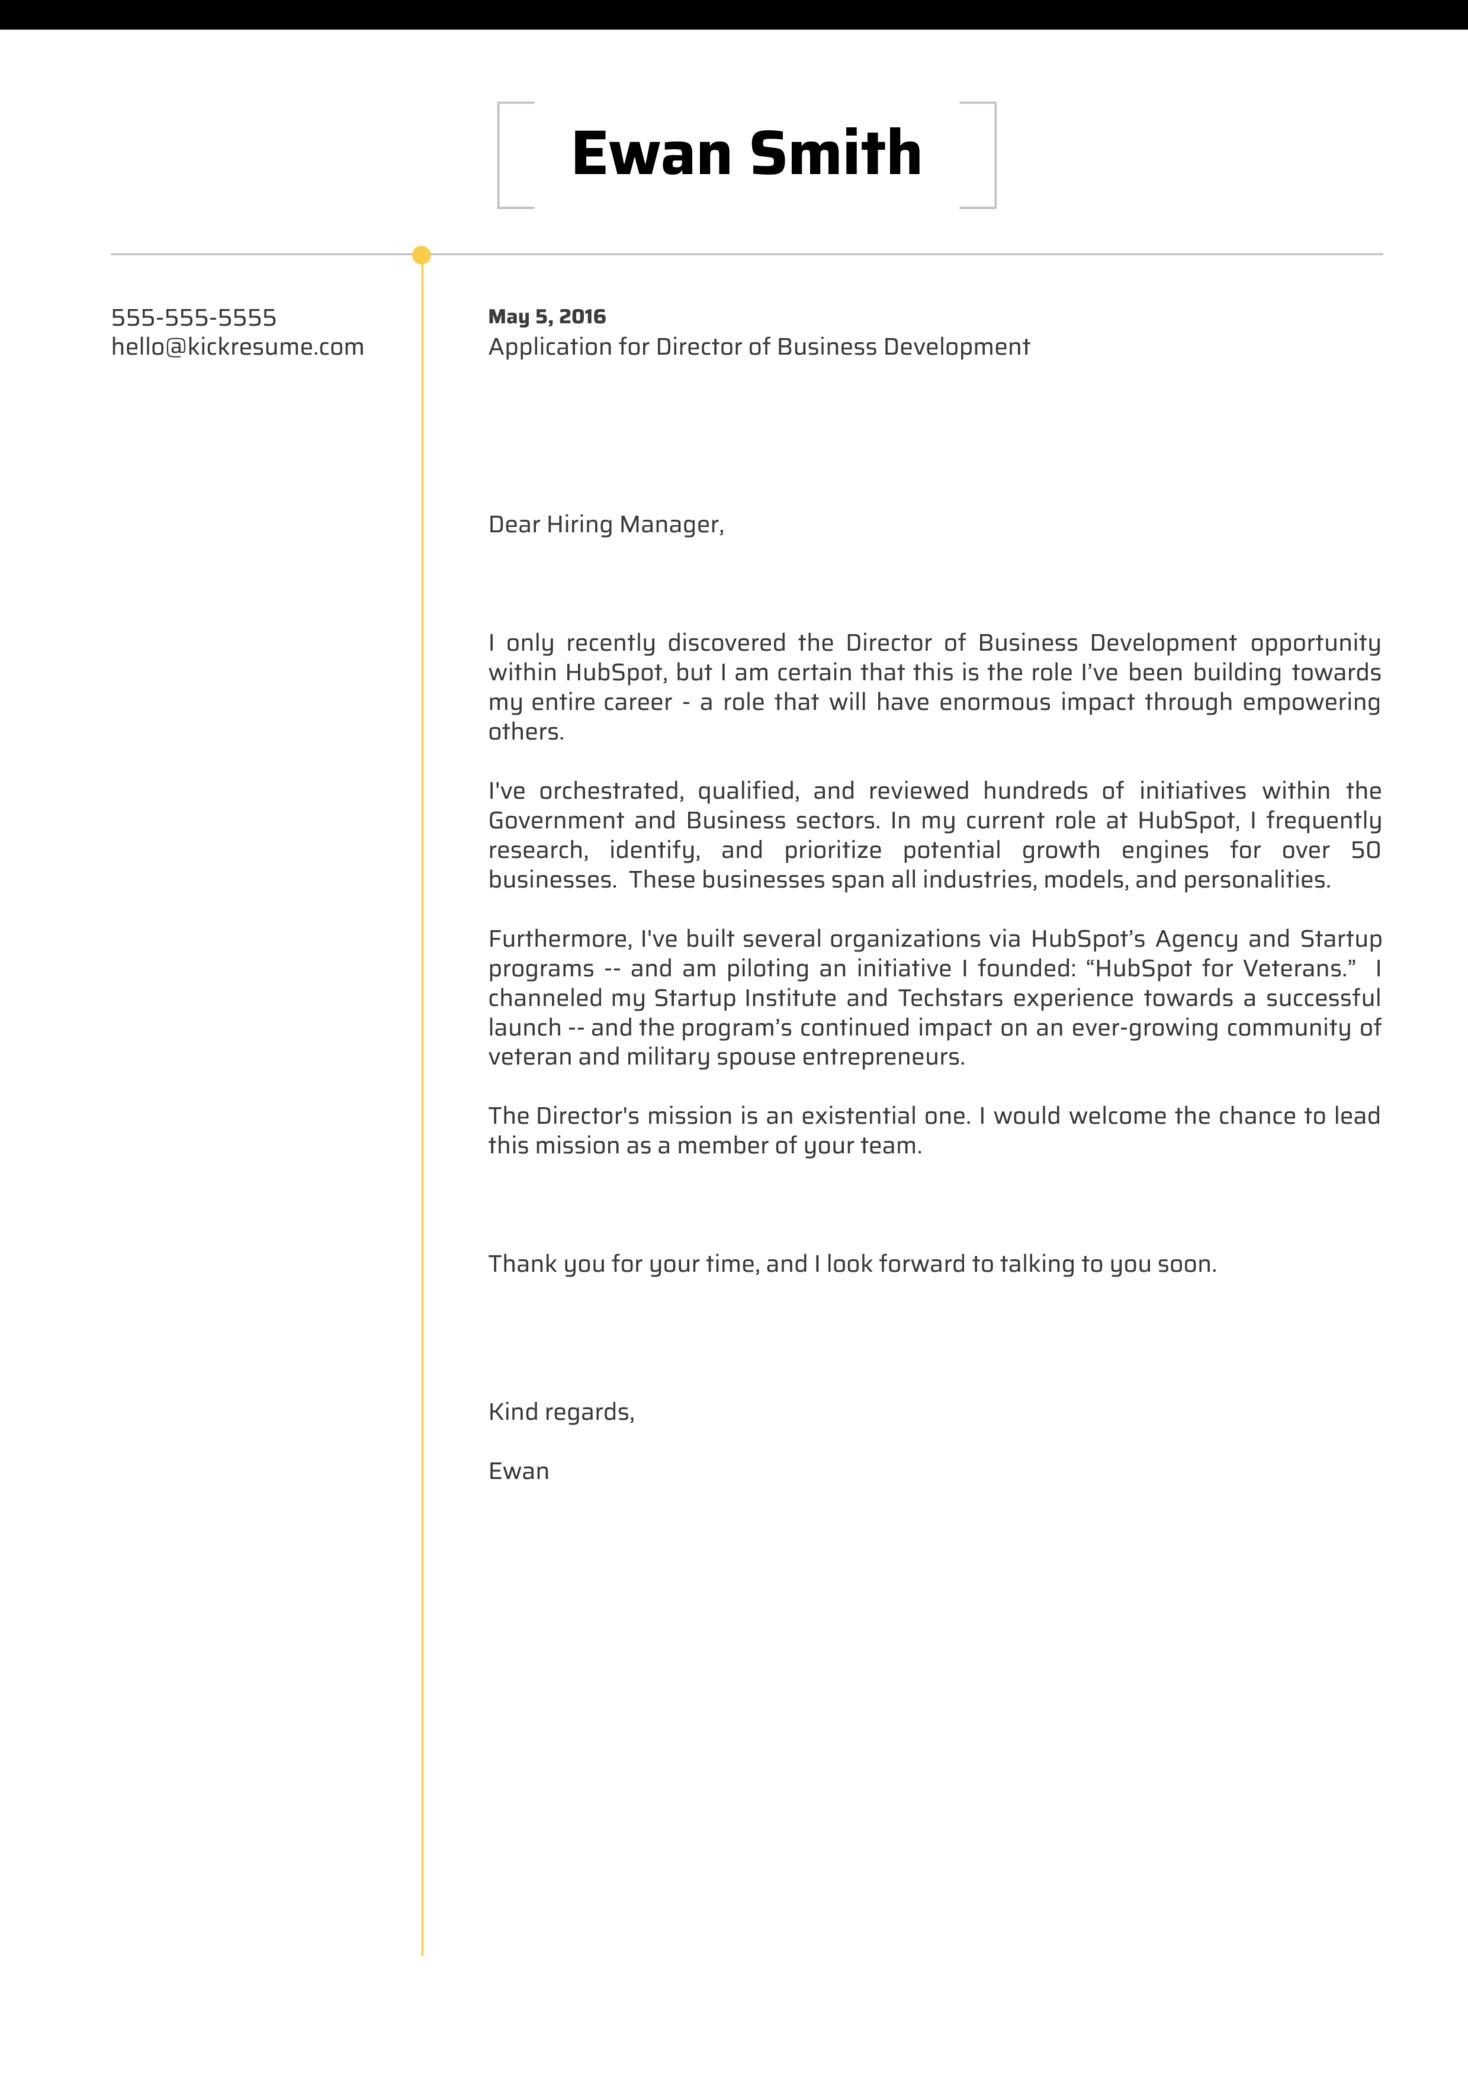 HubSpot Director of Business Development Cover Letter Sample